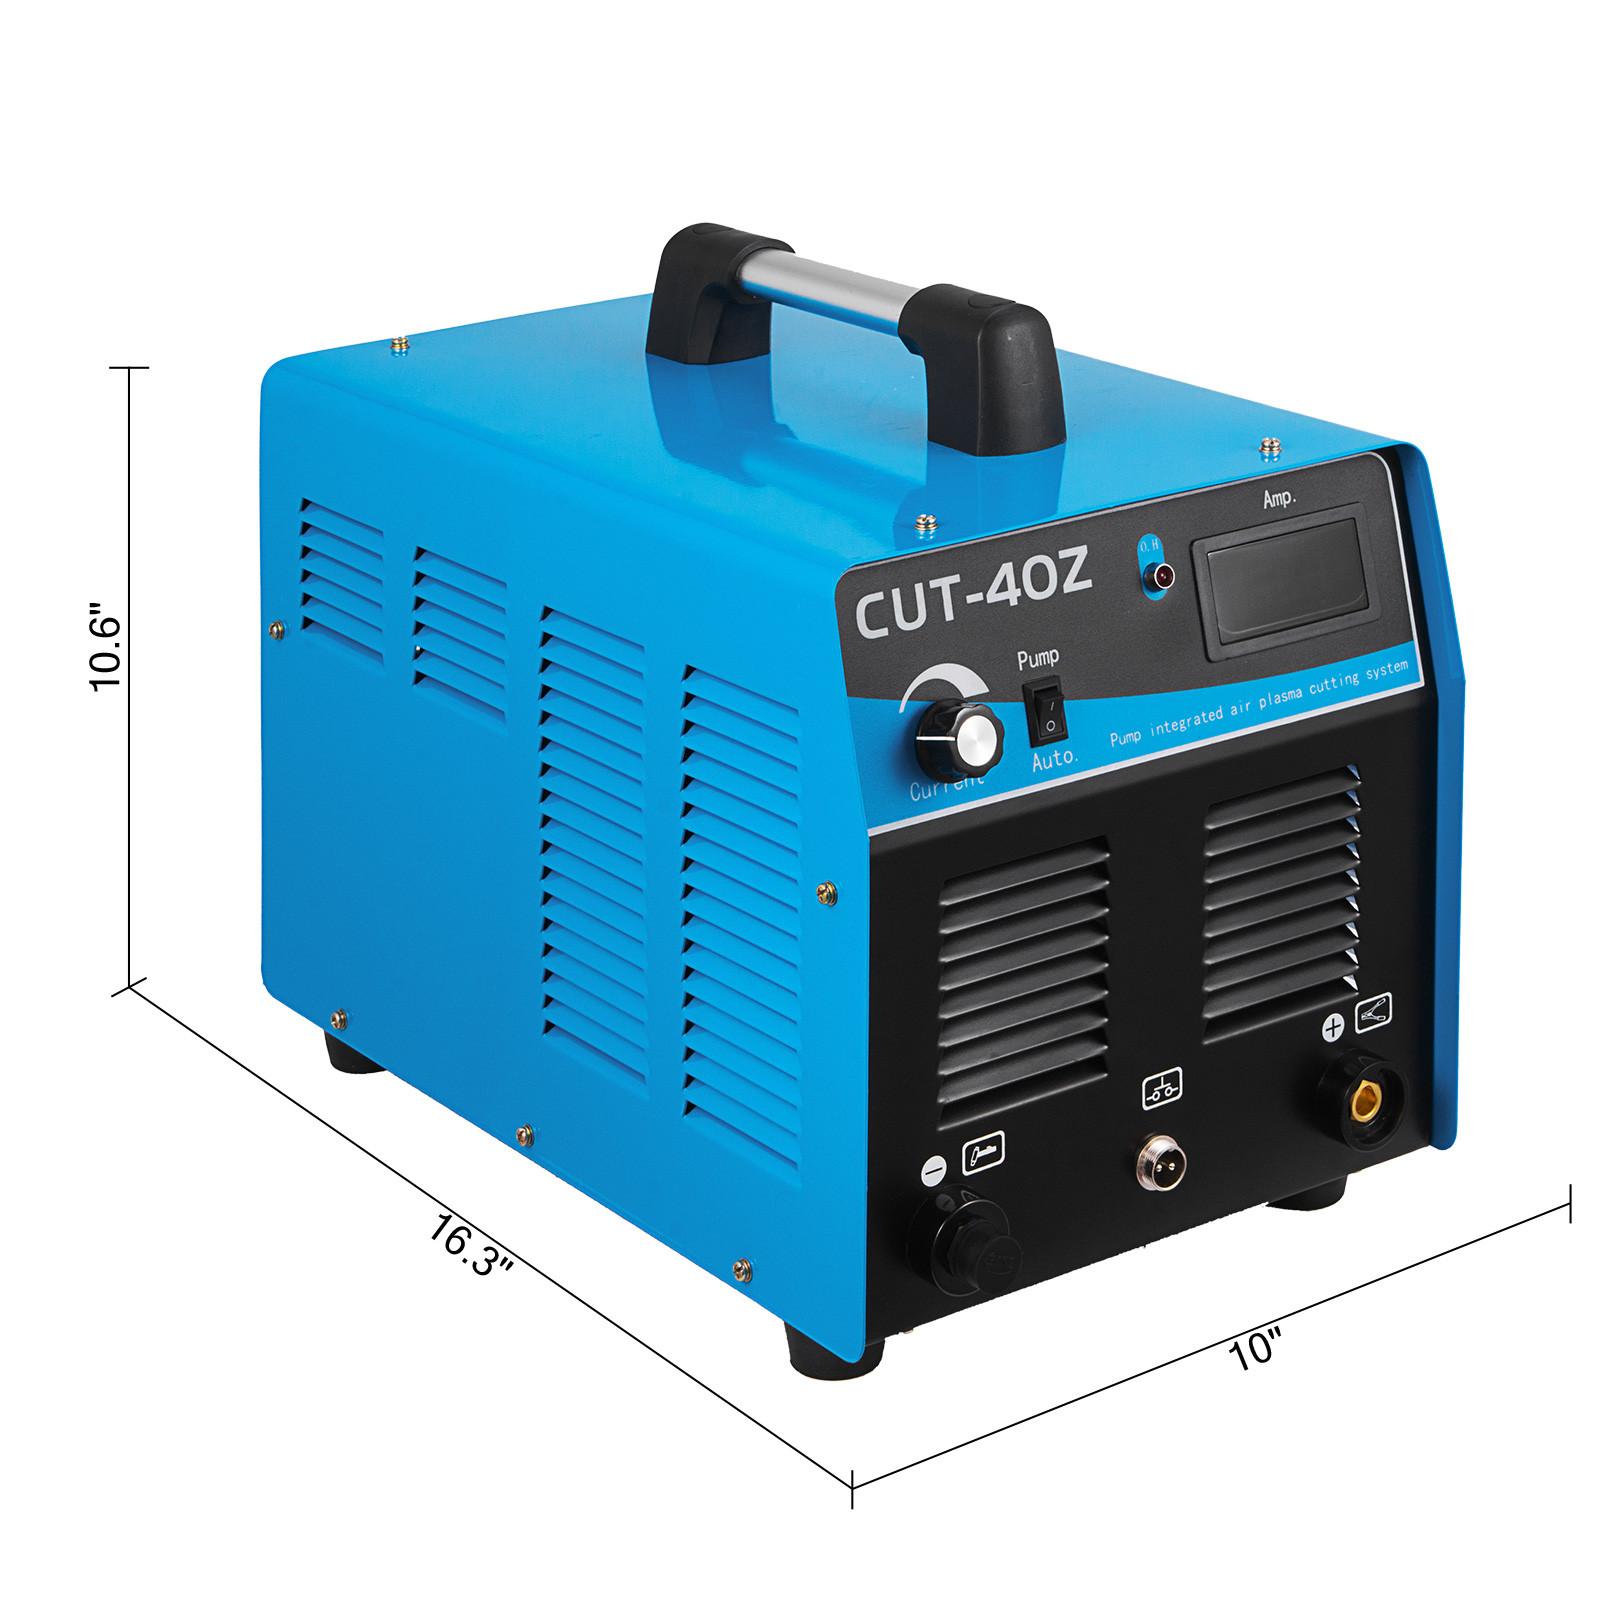 40-85A-Plasma-Cutter-Built-In-Air-Compressor-Inverter-Cutting-Machine-Cut-35mm thumbnail 14